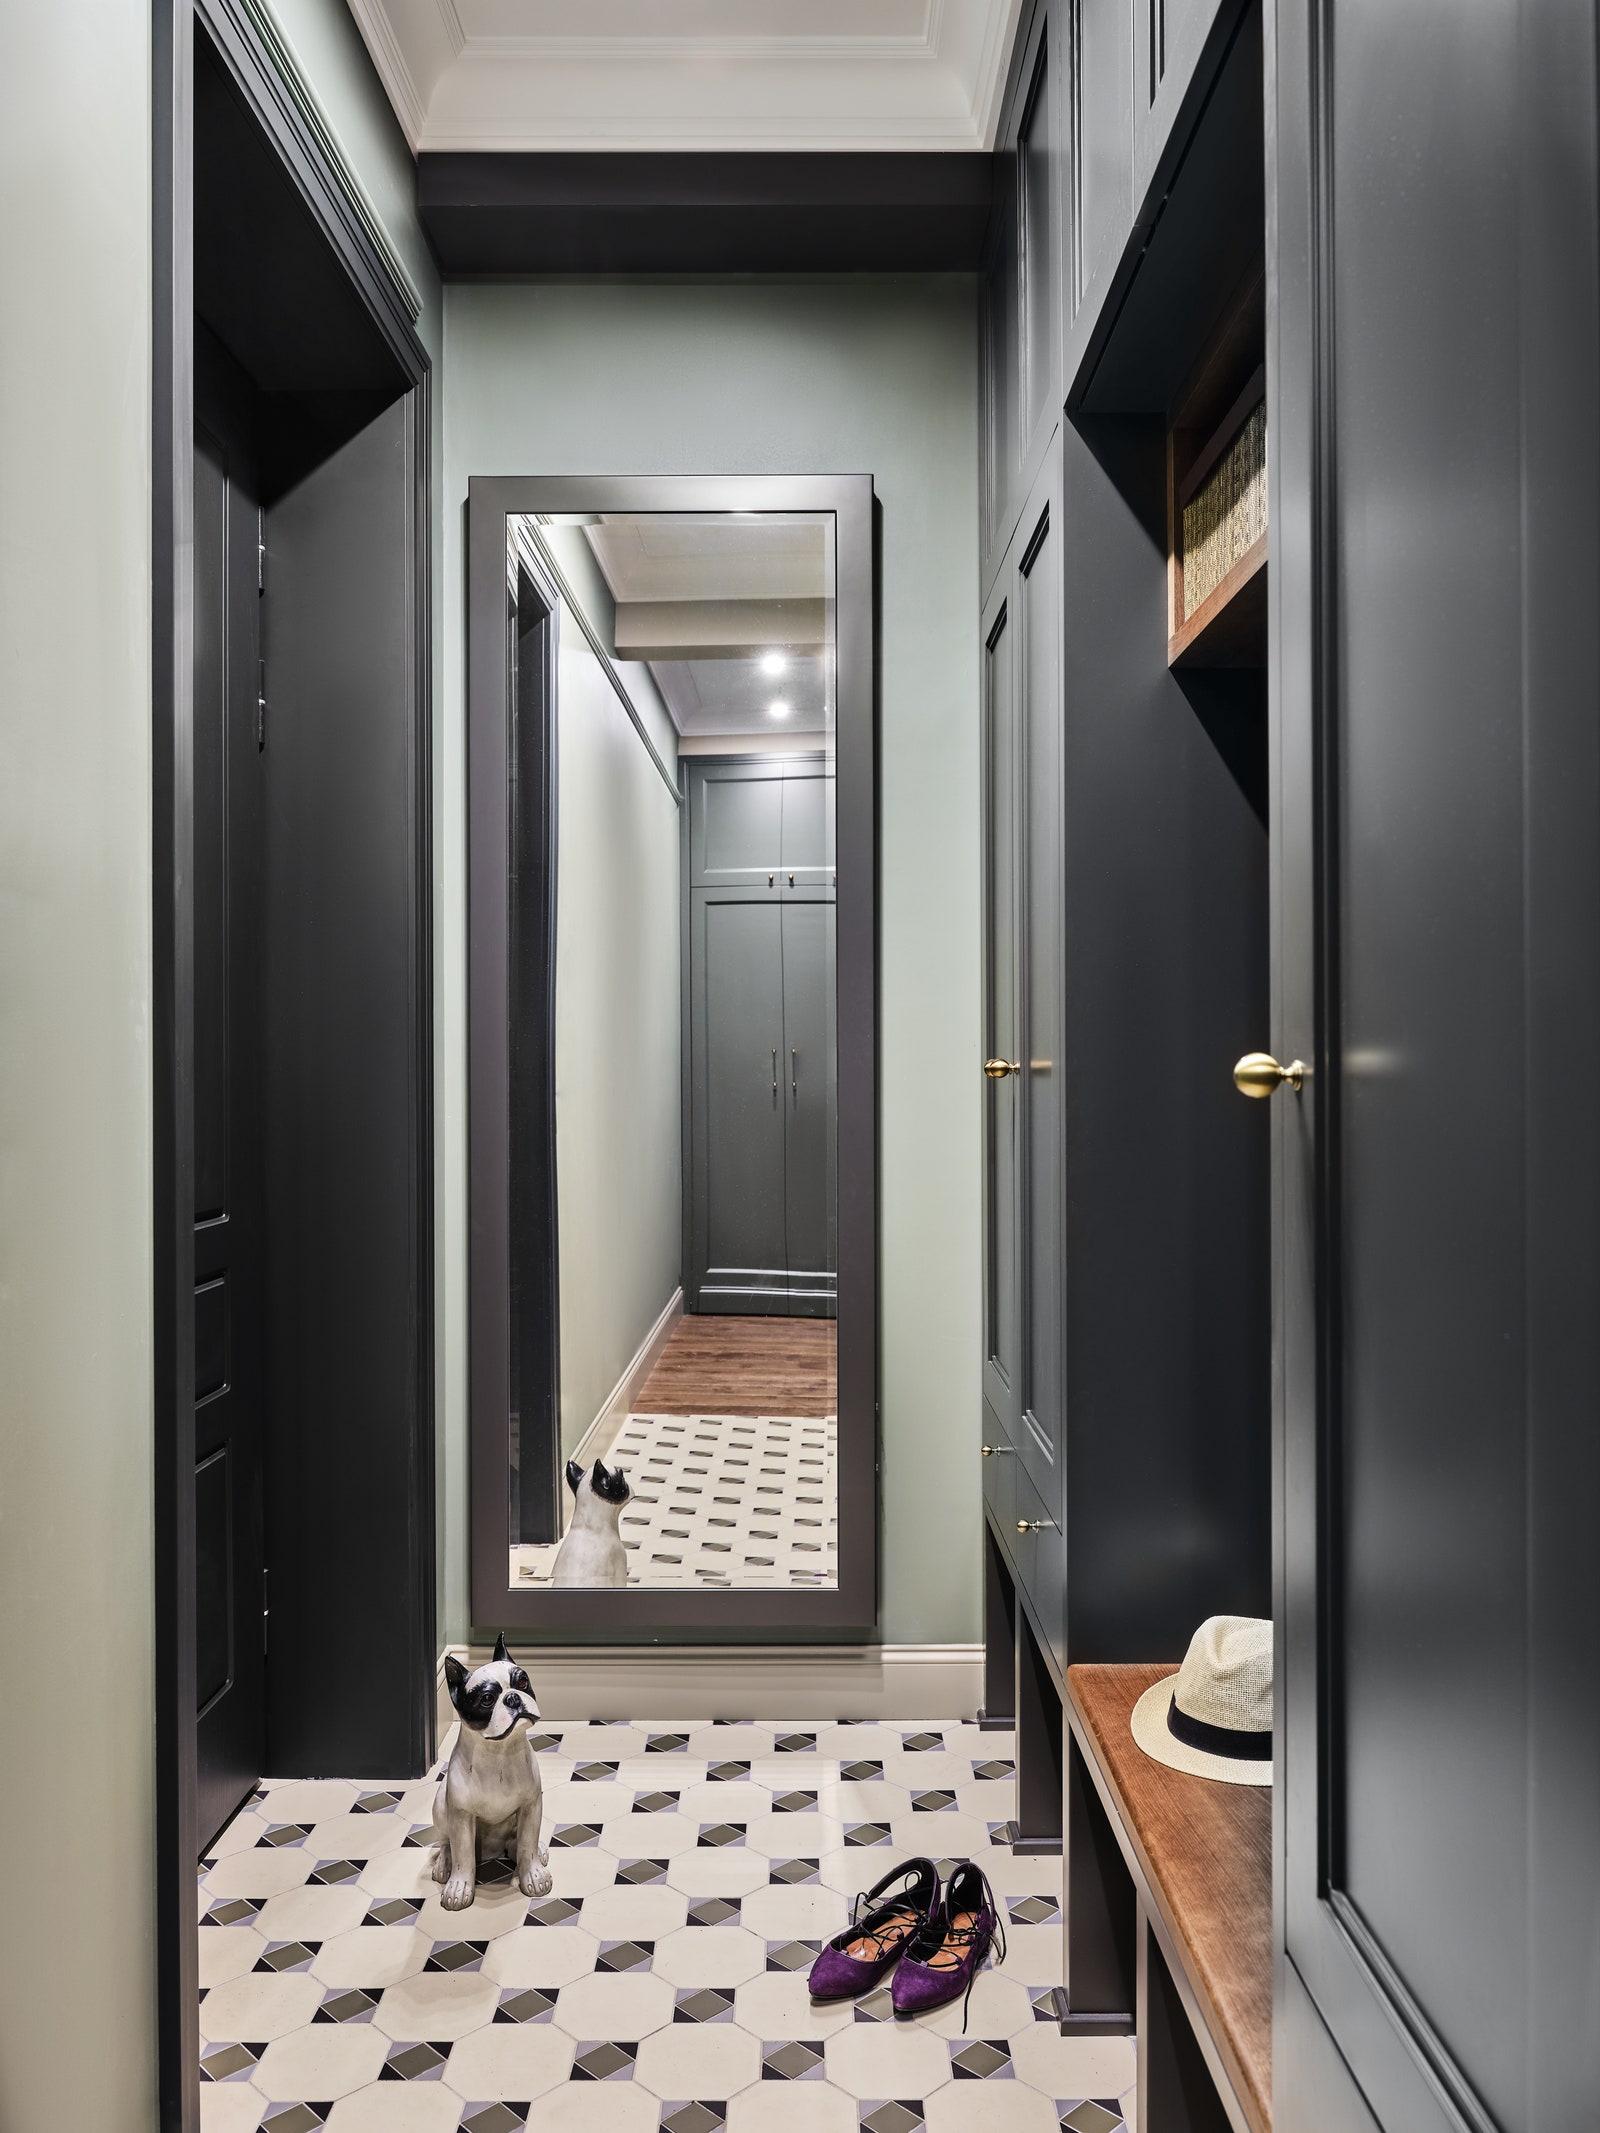 .             quot quot  Original Style   Home Concept  Marus Studio   quotquot.     .